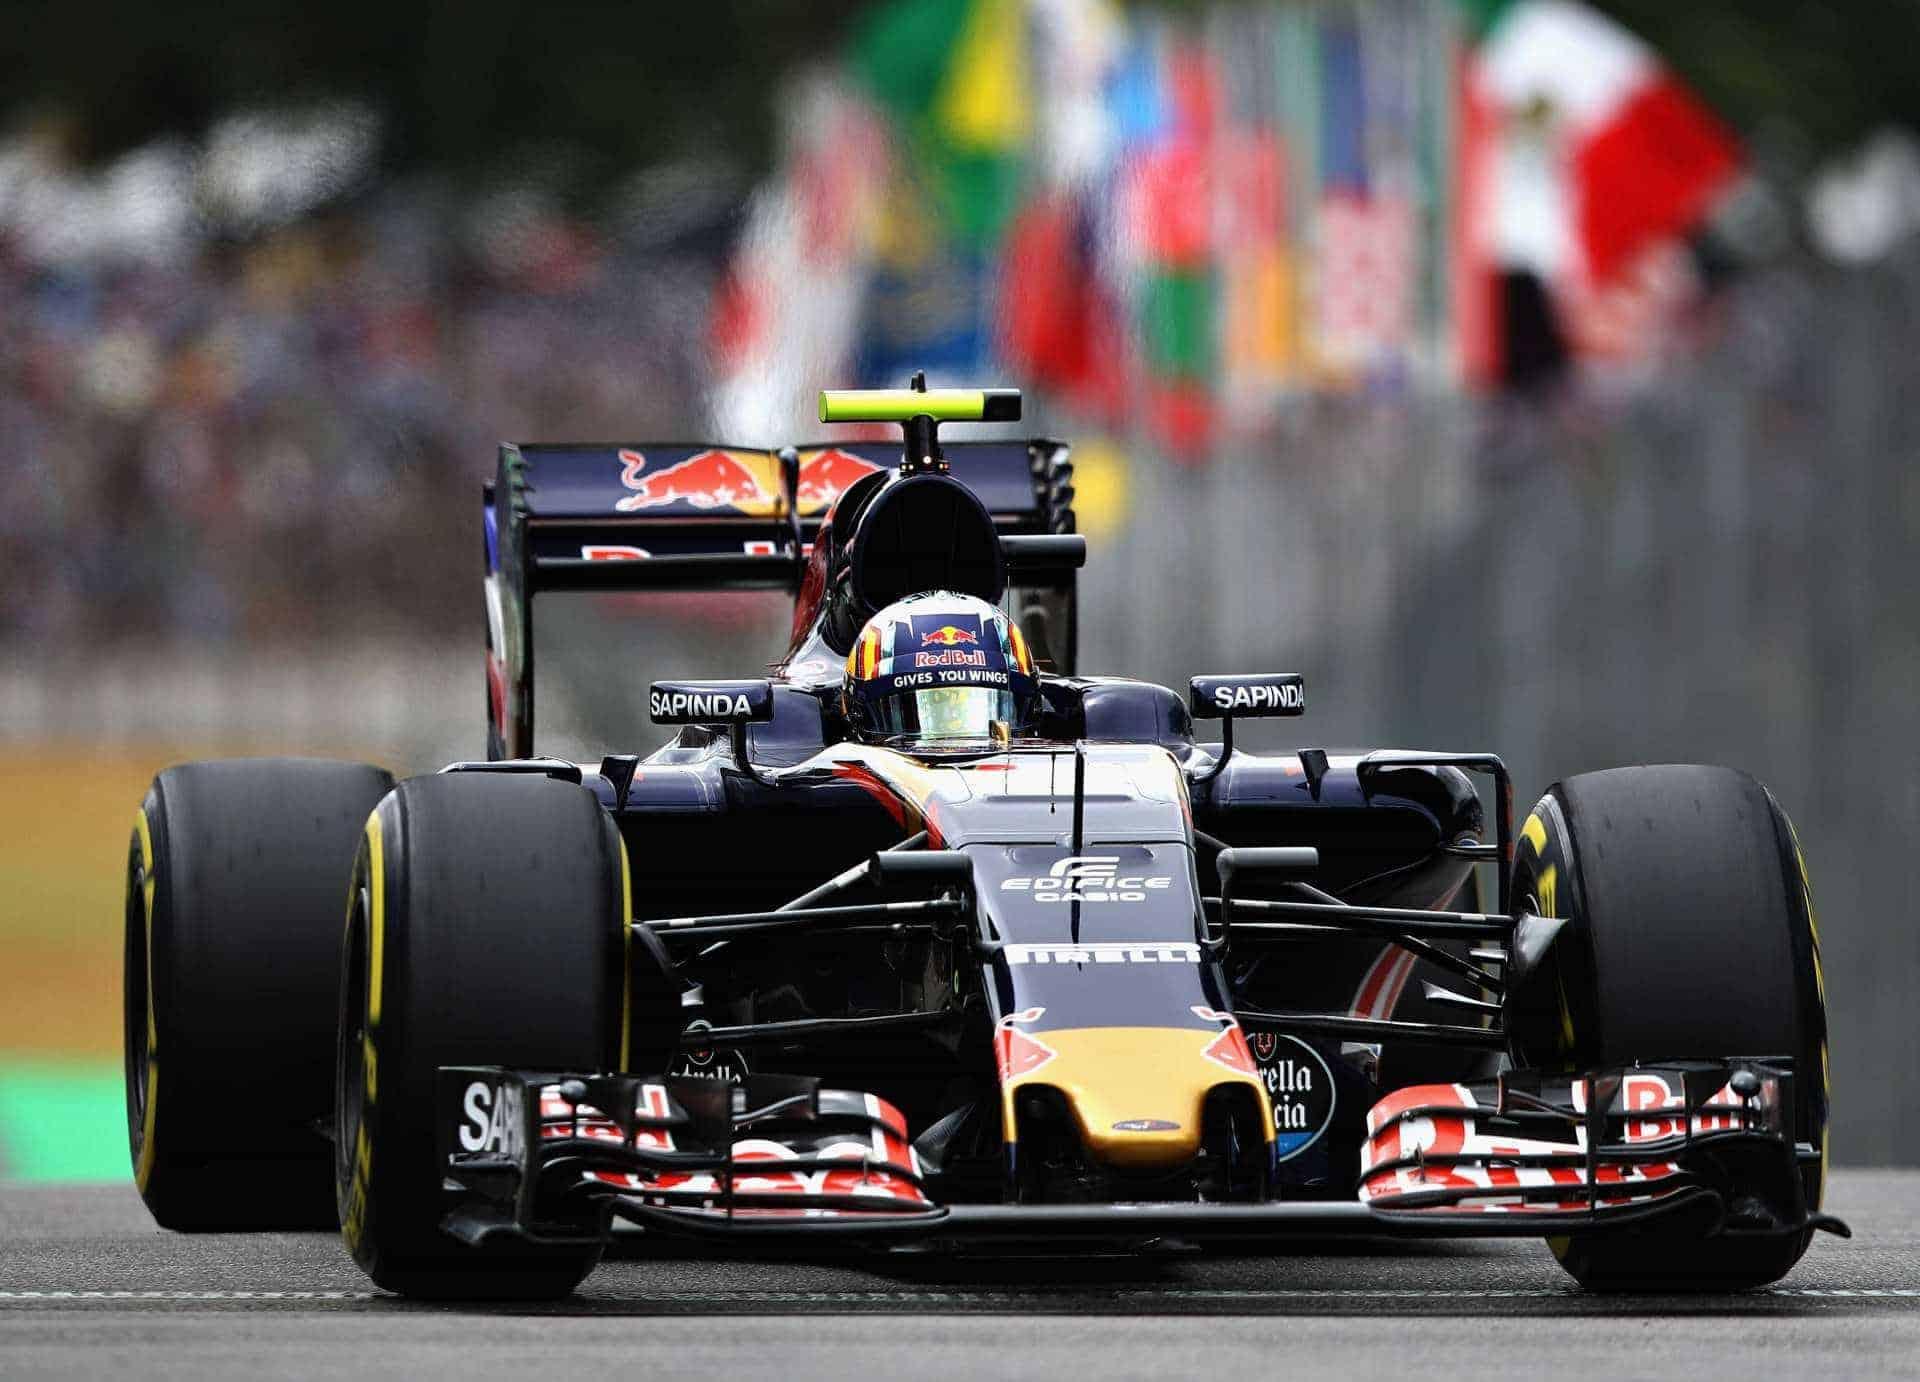 Sainz Toro Rosso Brazilian GP F1 2016 Photo Red Bull